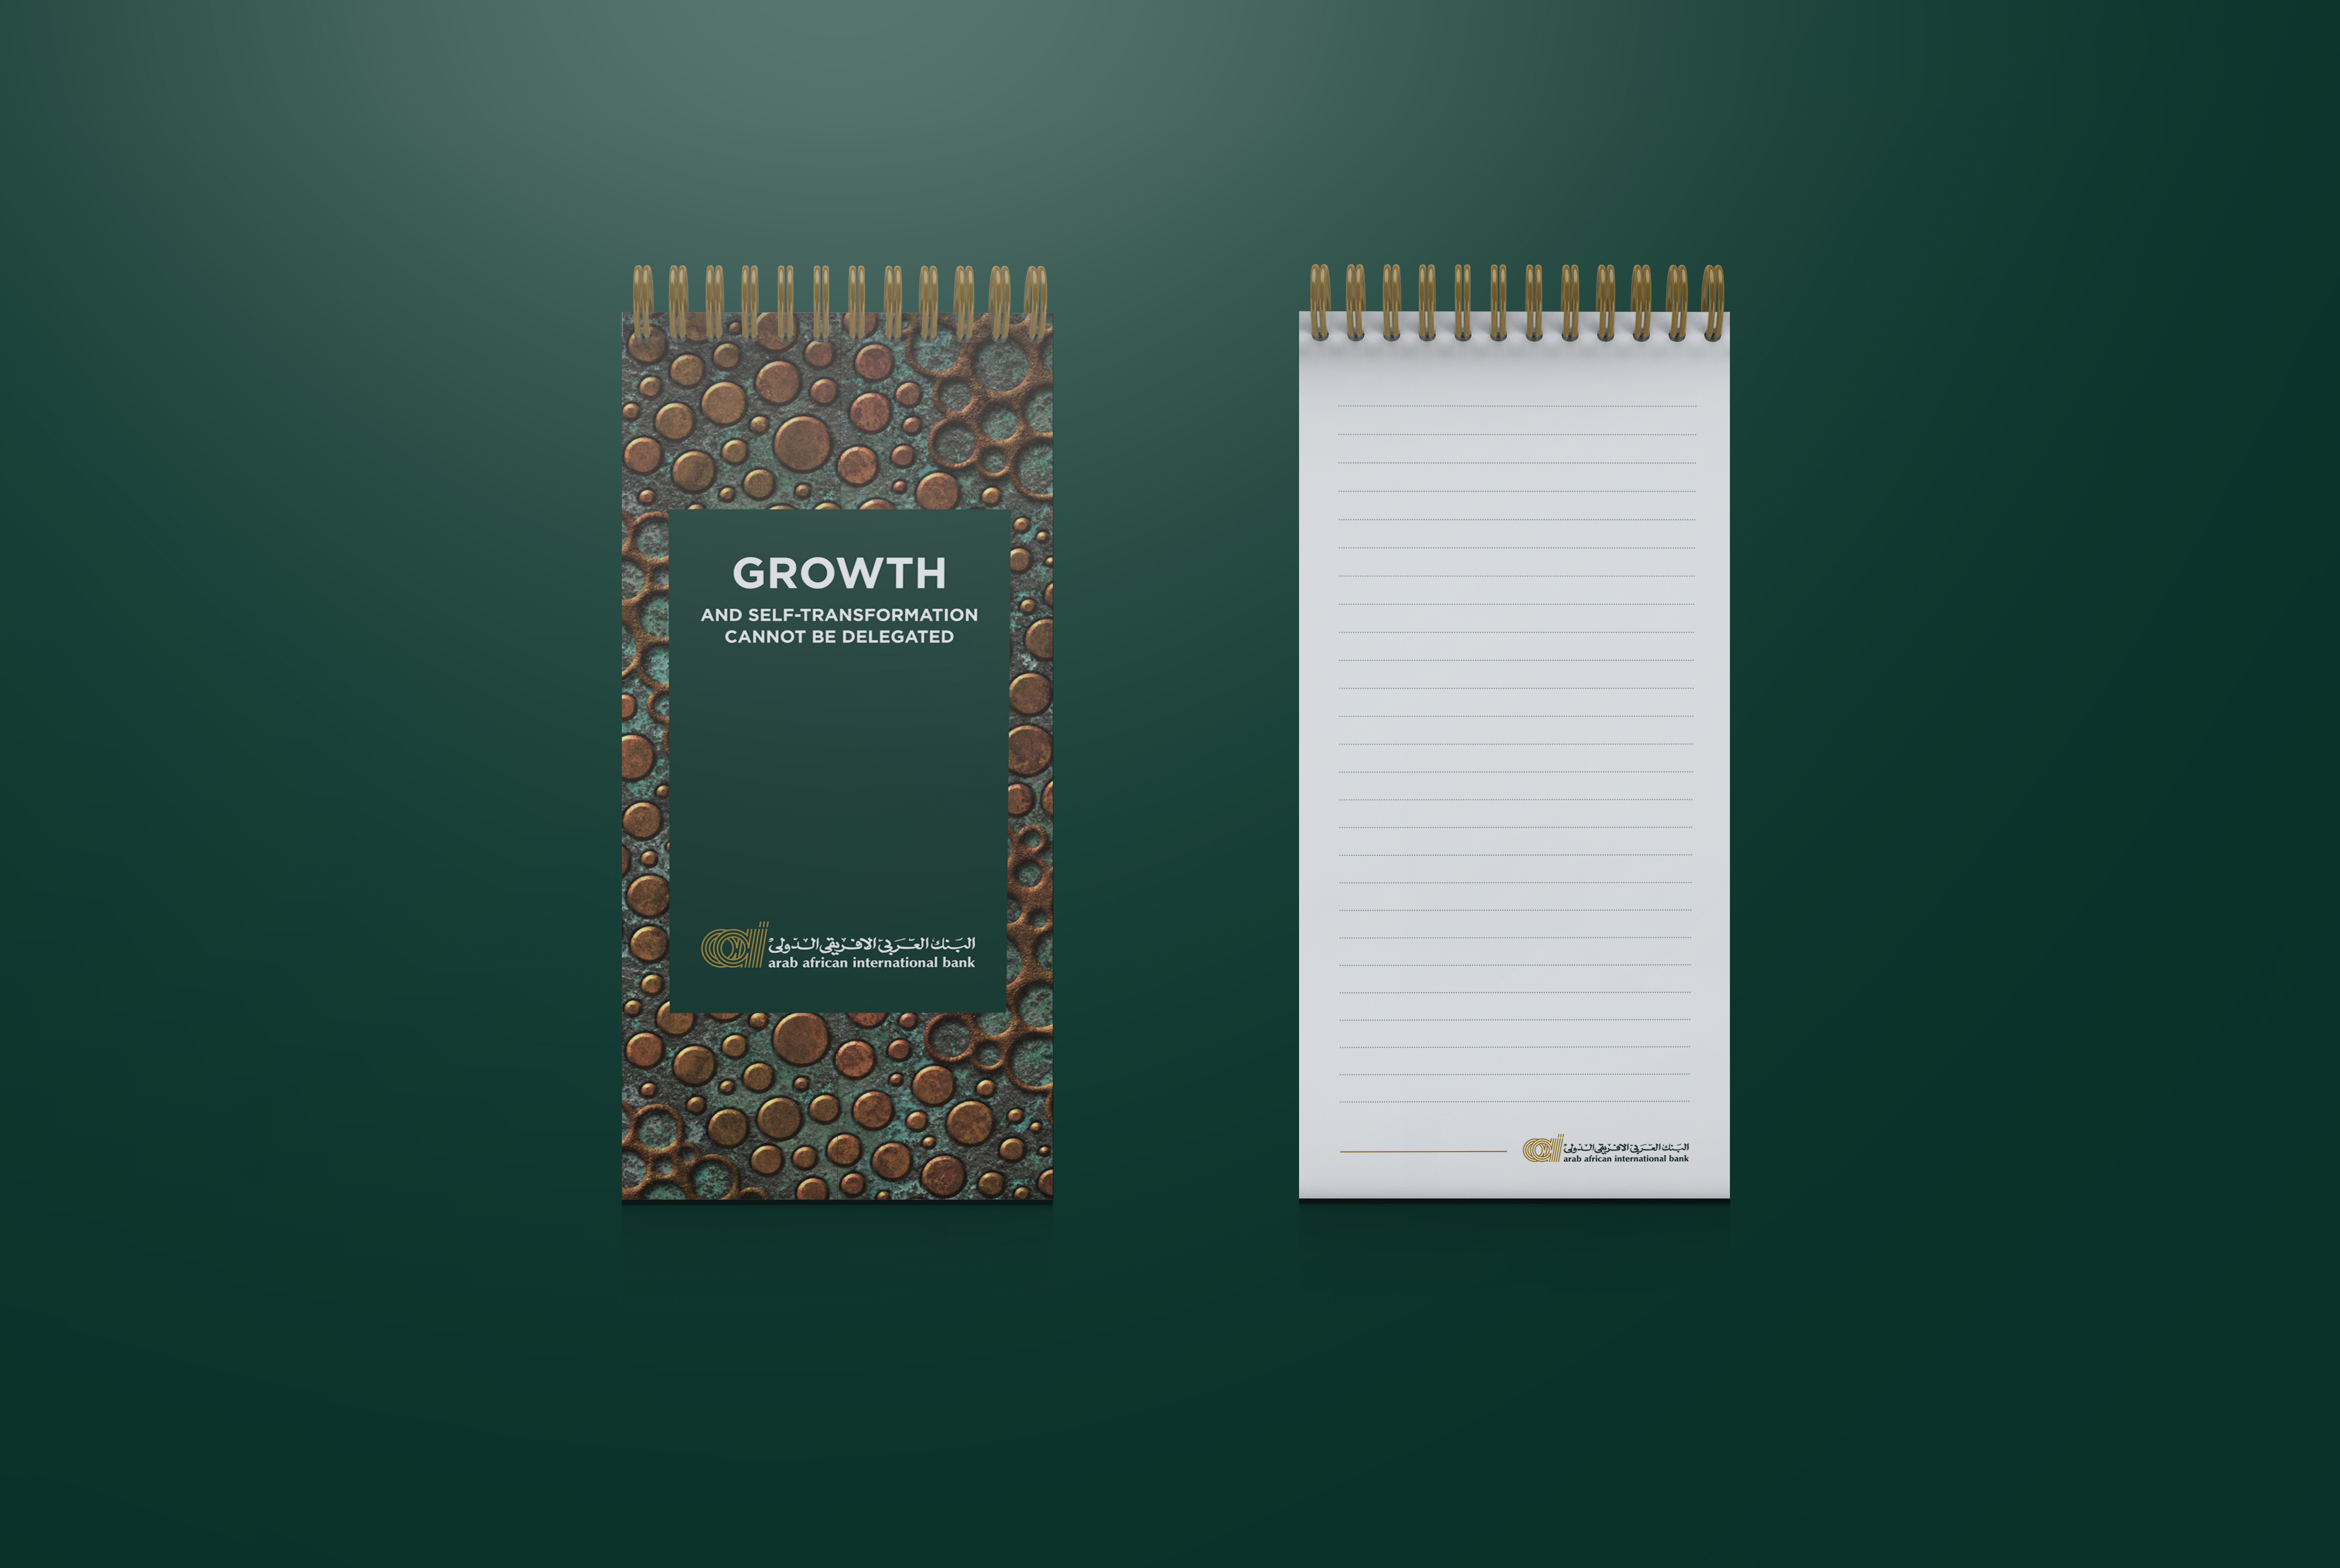 04 A5 Spiral Notebook Mockup_02